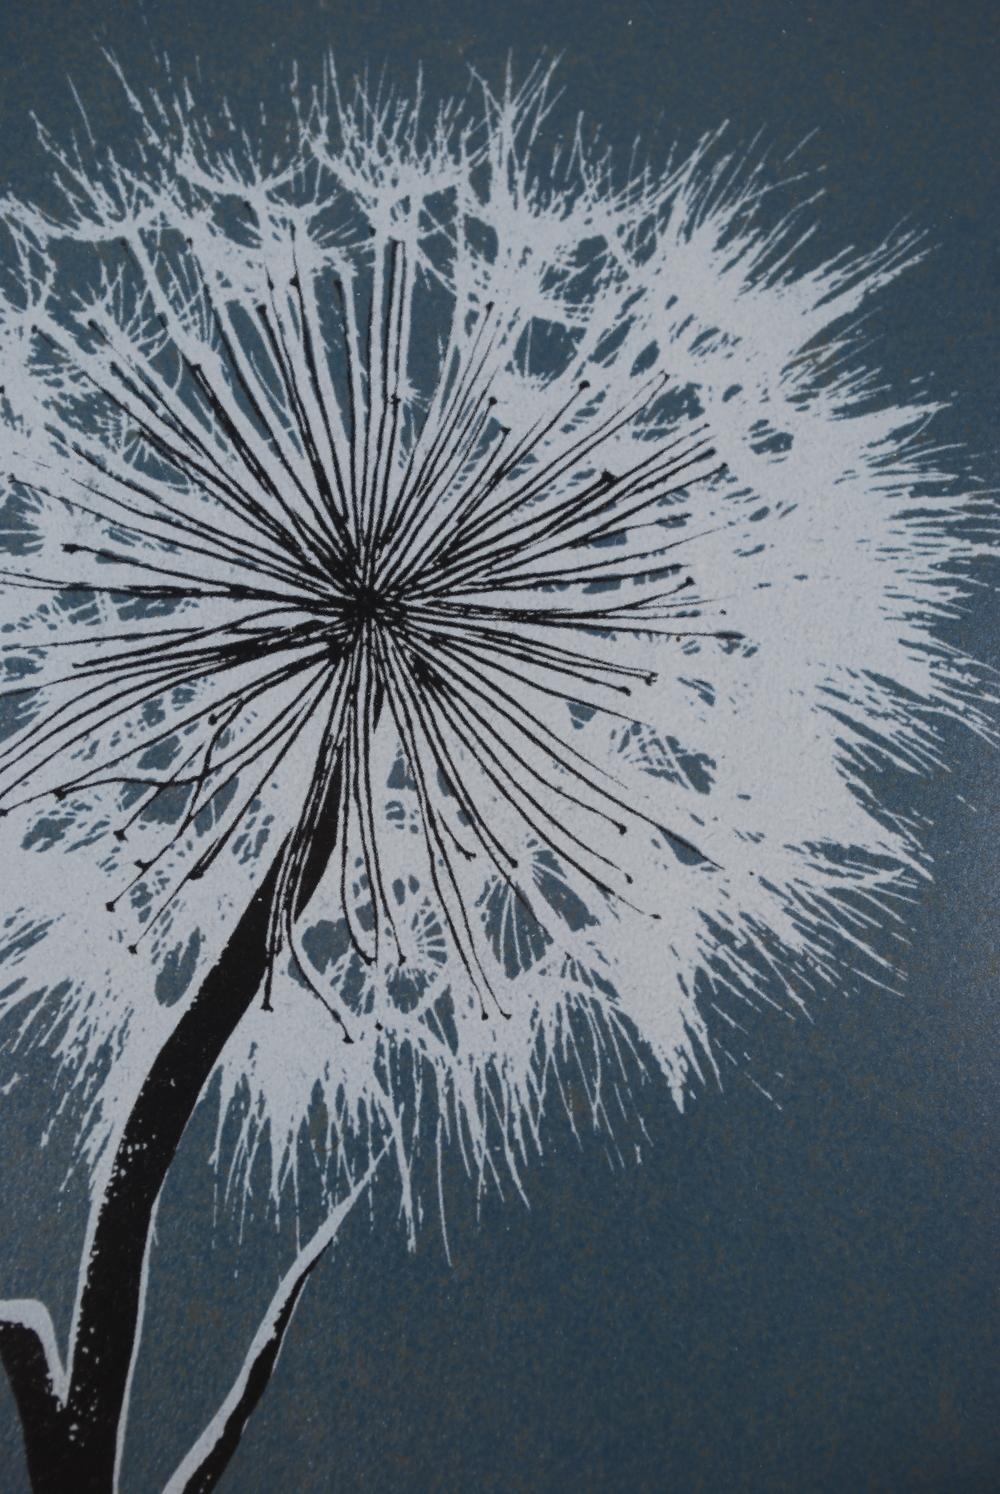 Dandelion original screen print by Ray Waal 60's